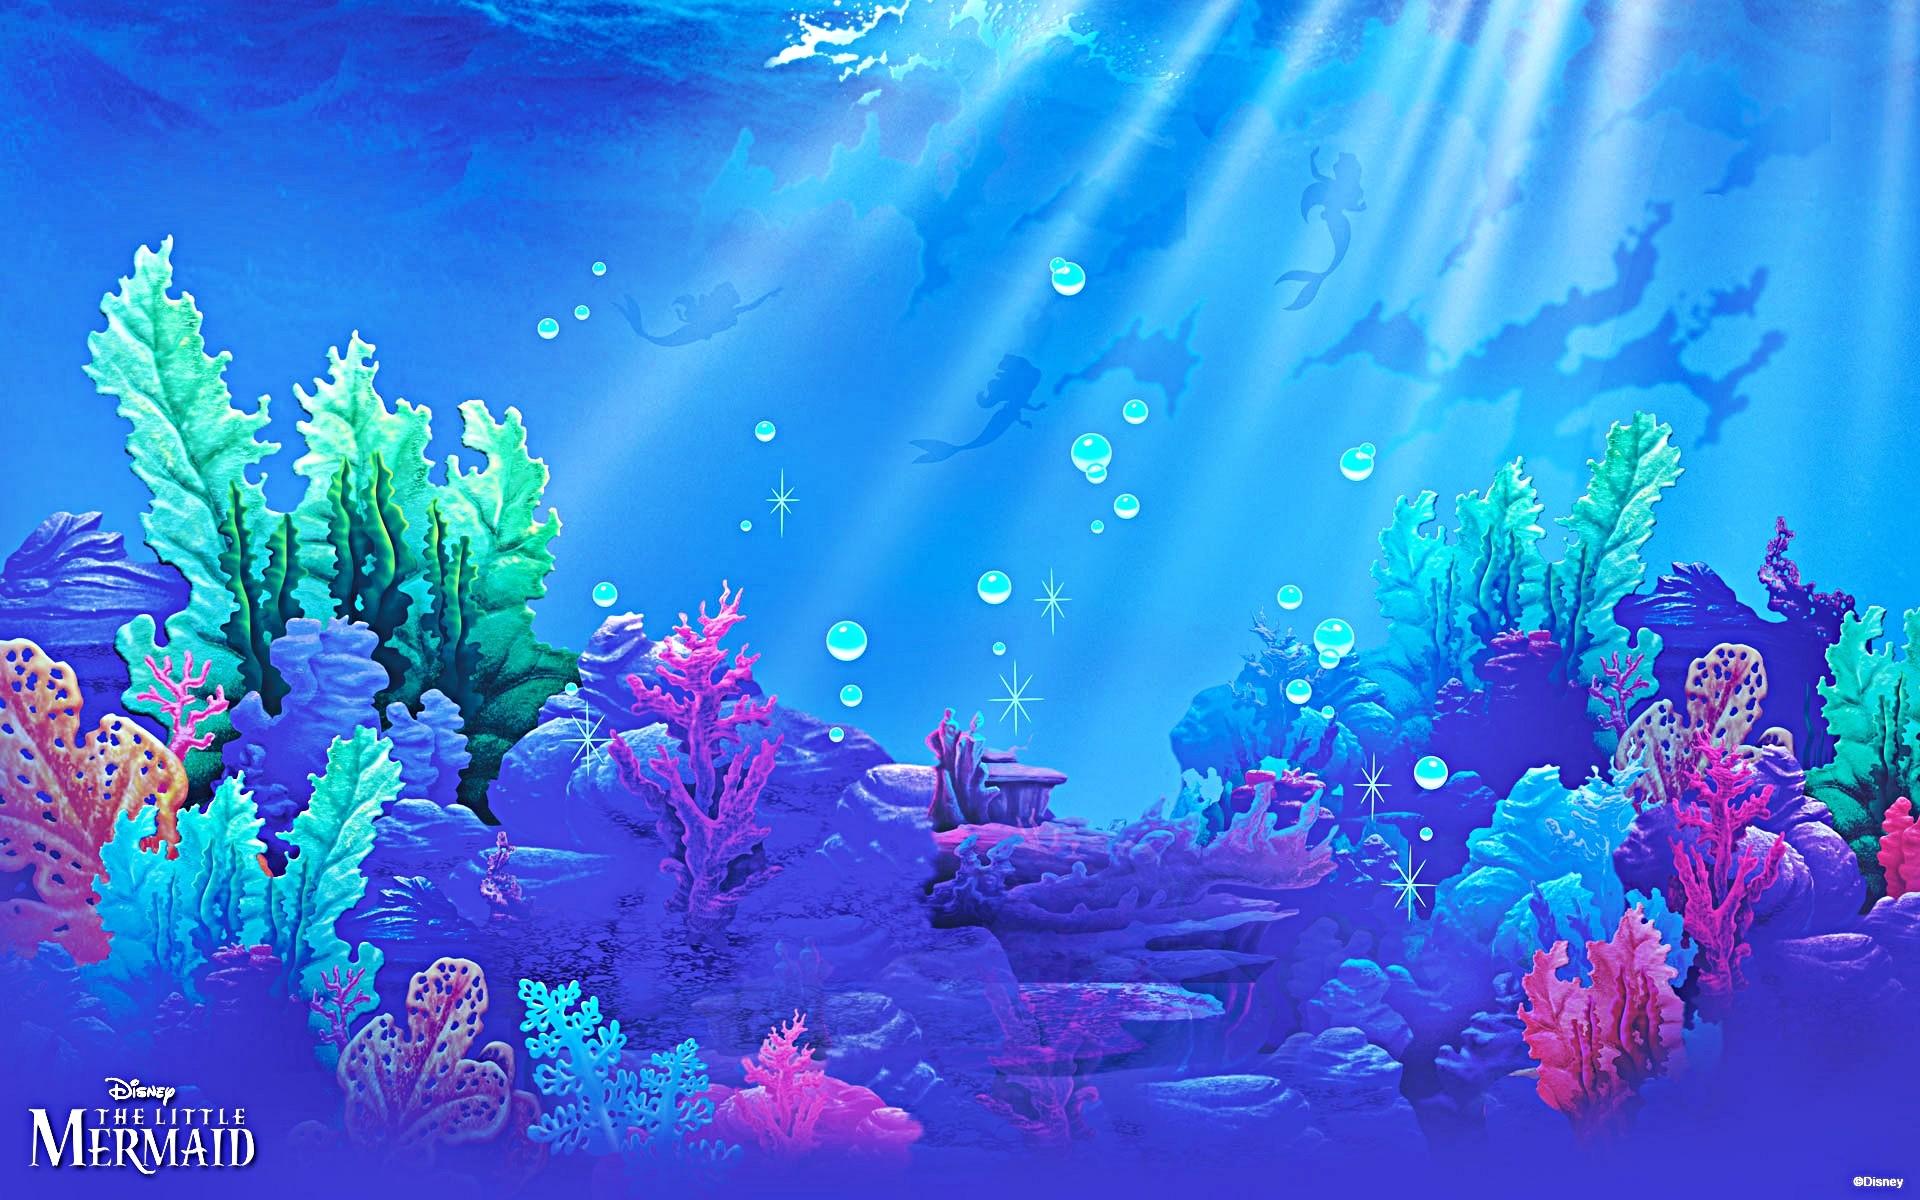 Little Mermaid Wallpaper Iphone 63 Images